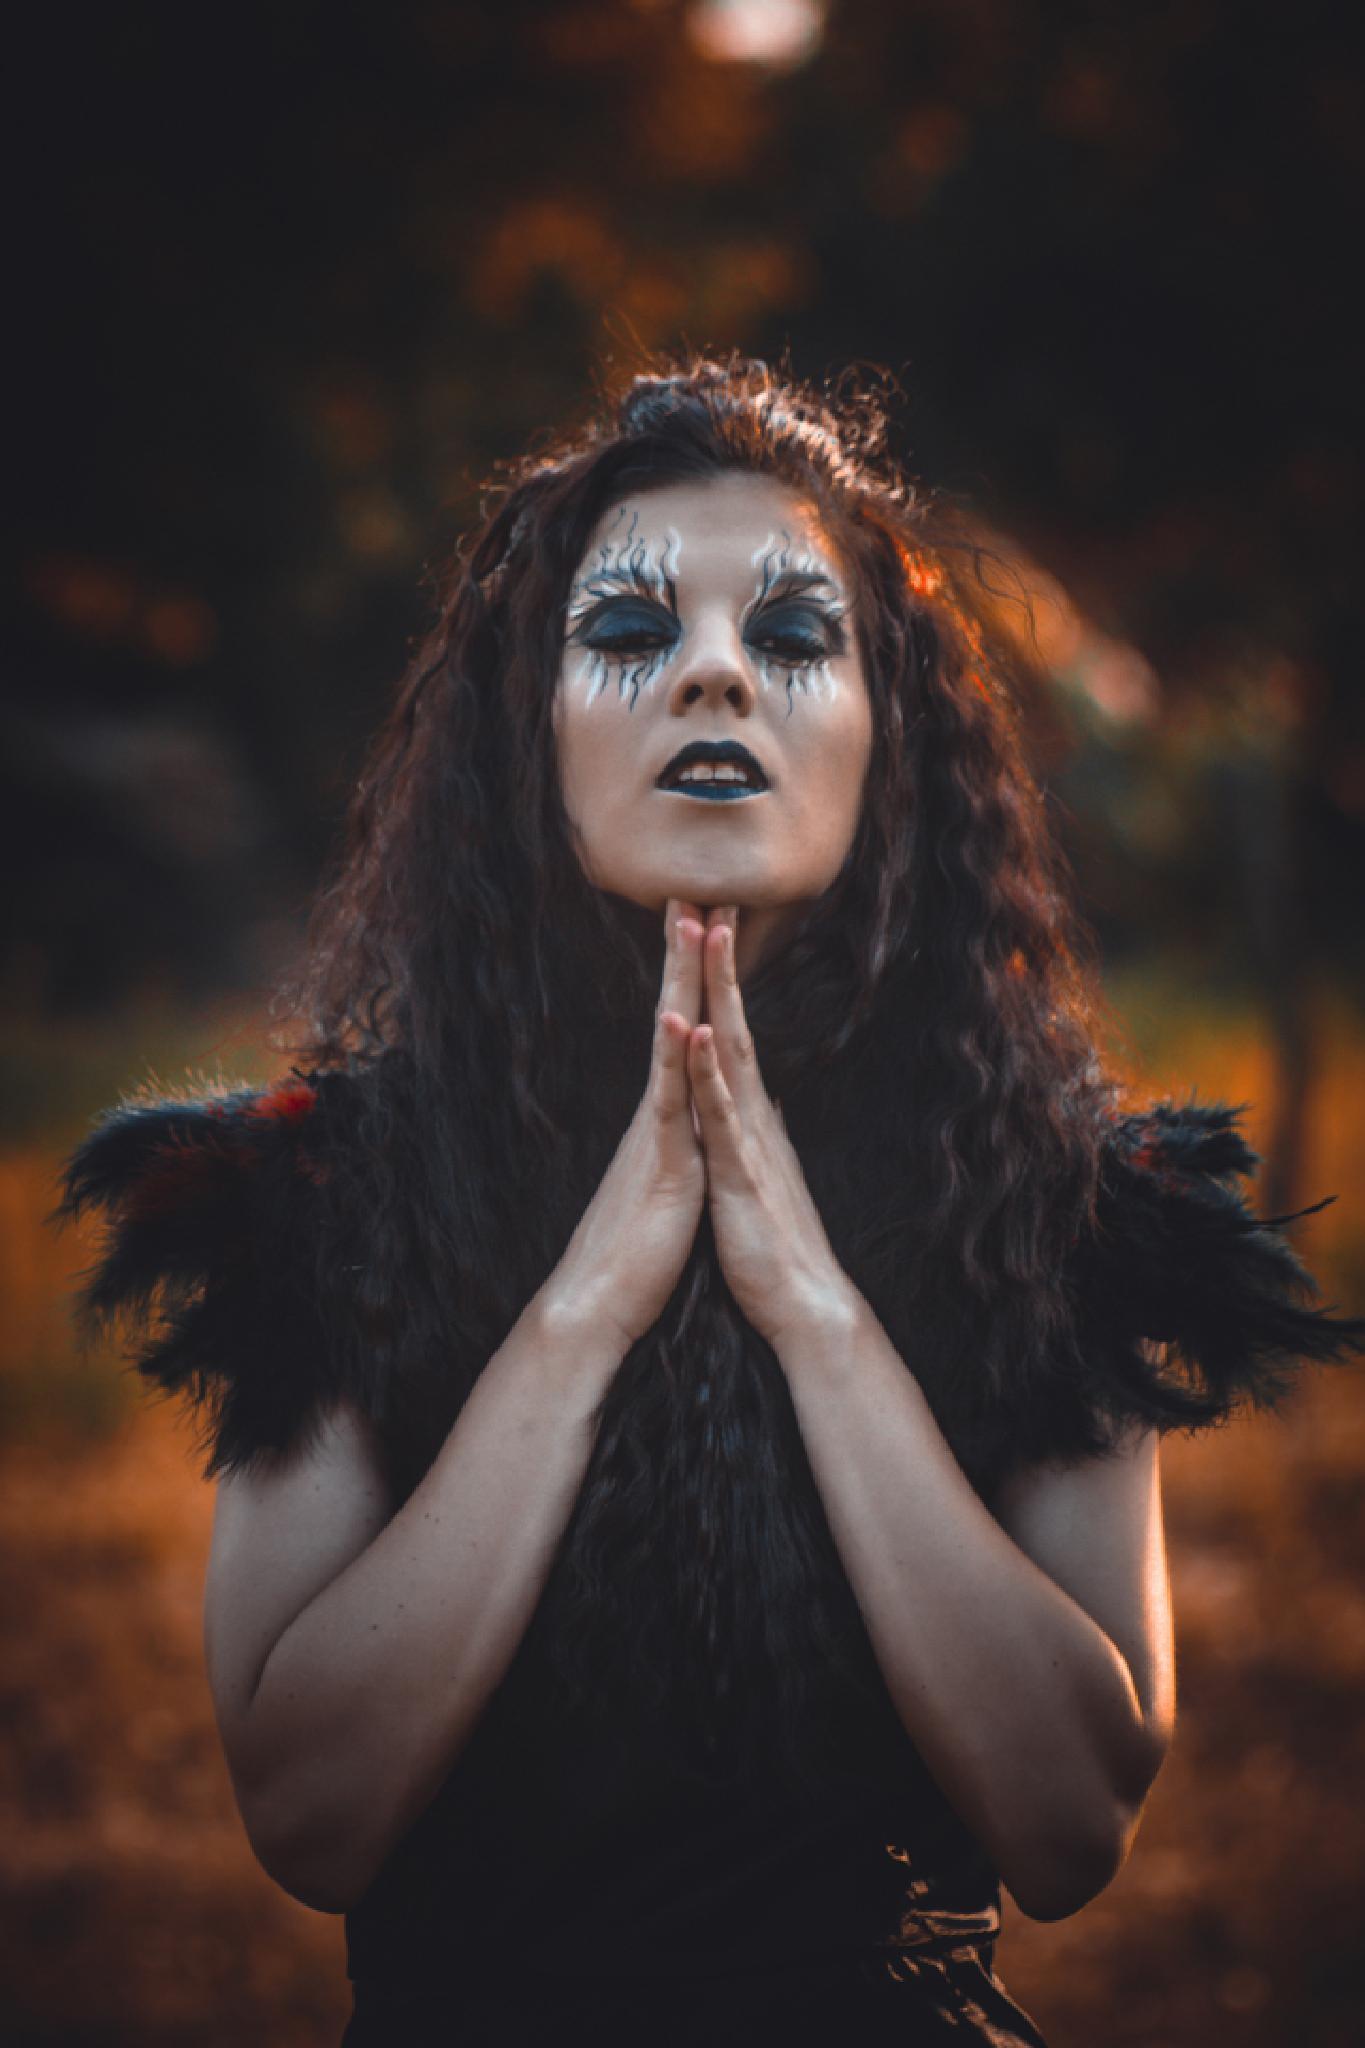 Phoenix by palkokatalin